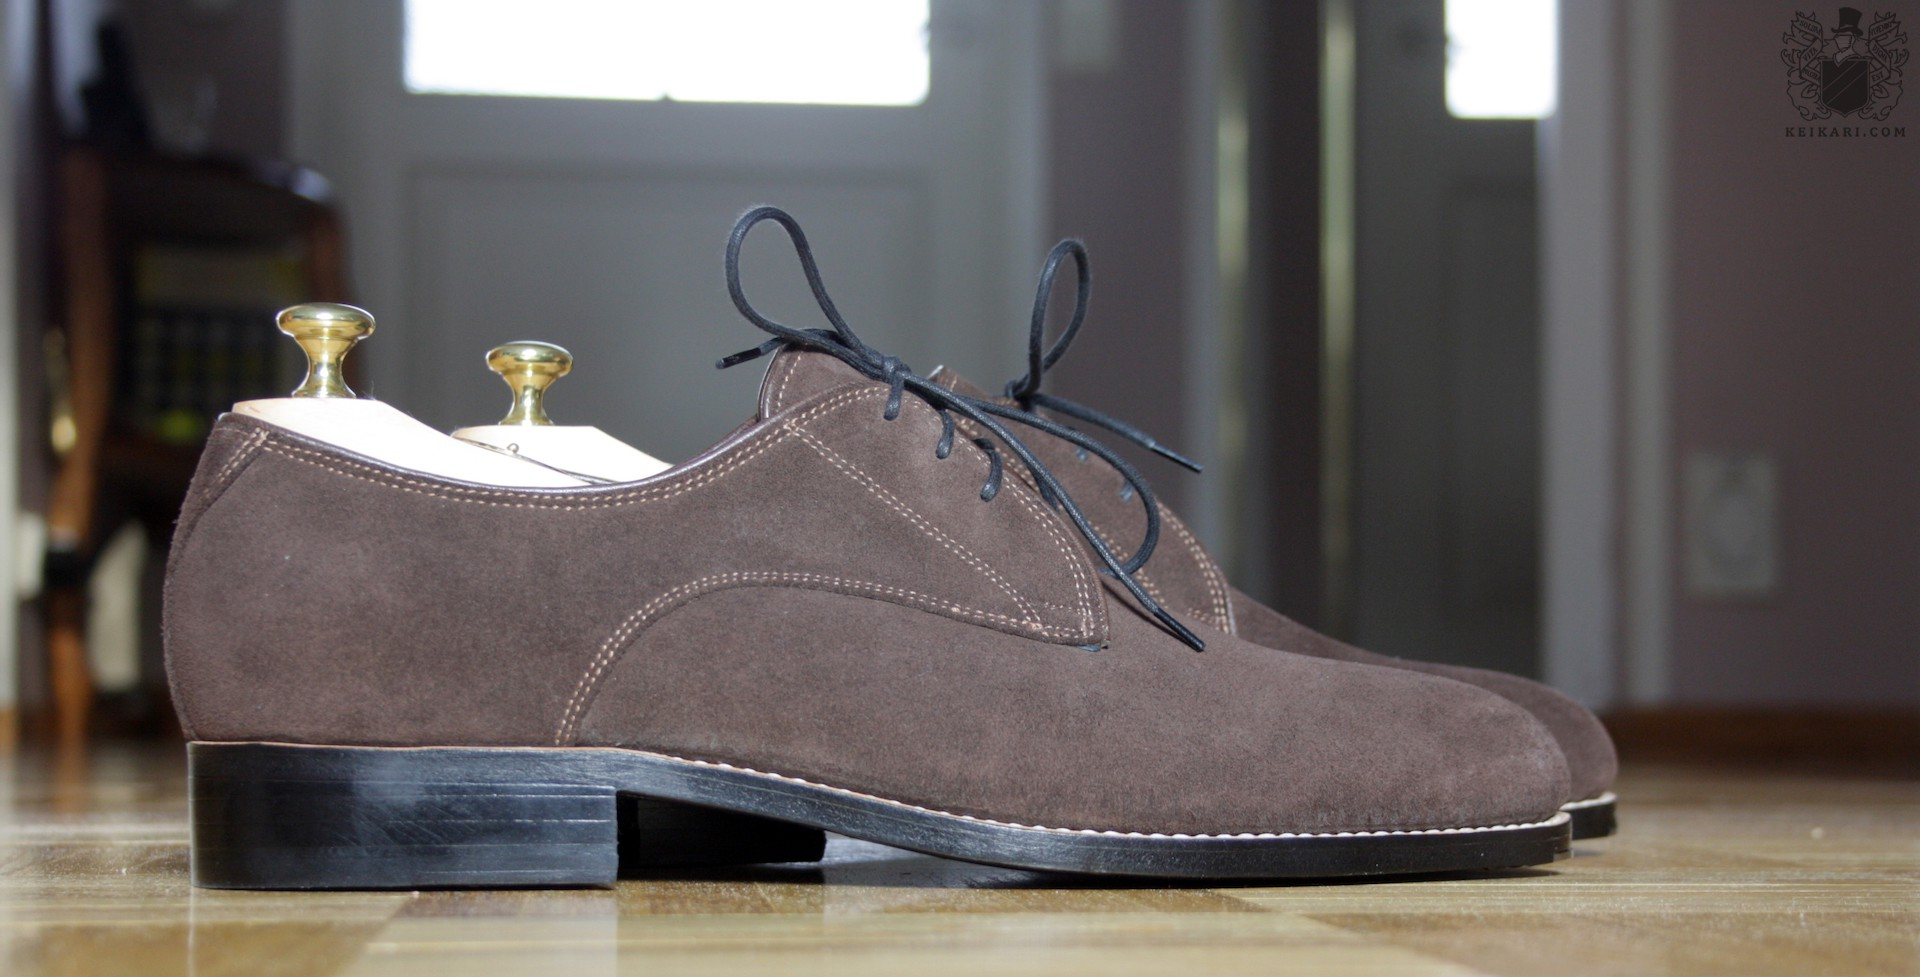 Anatomy_of_Buday_shoes_at_Keikari_dot_com06.jpg